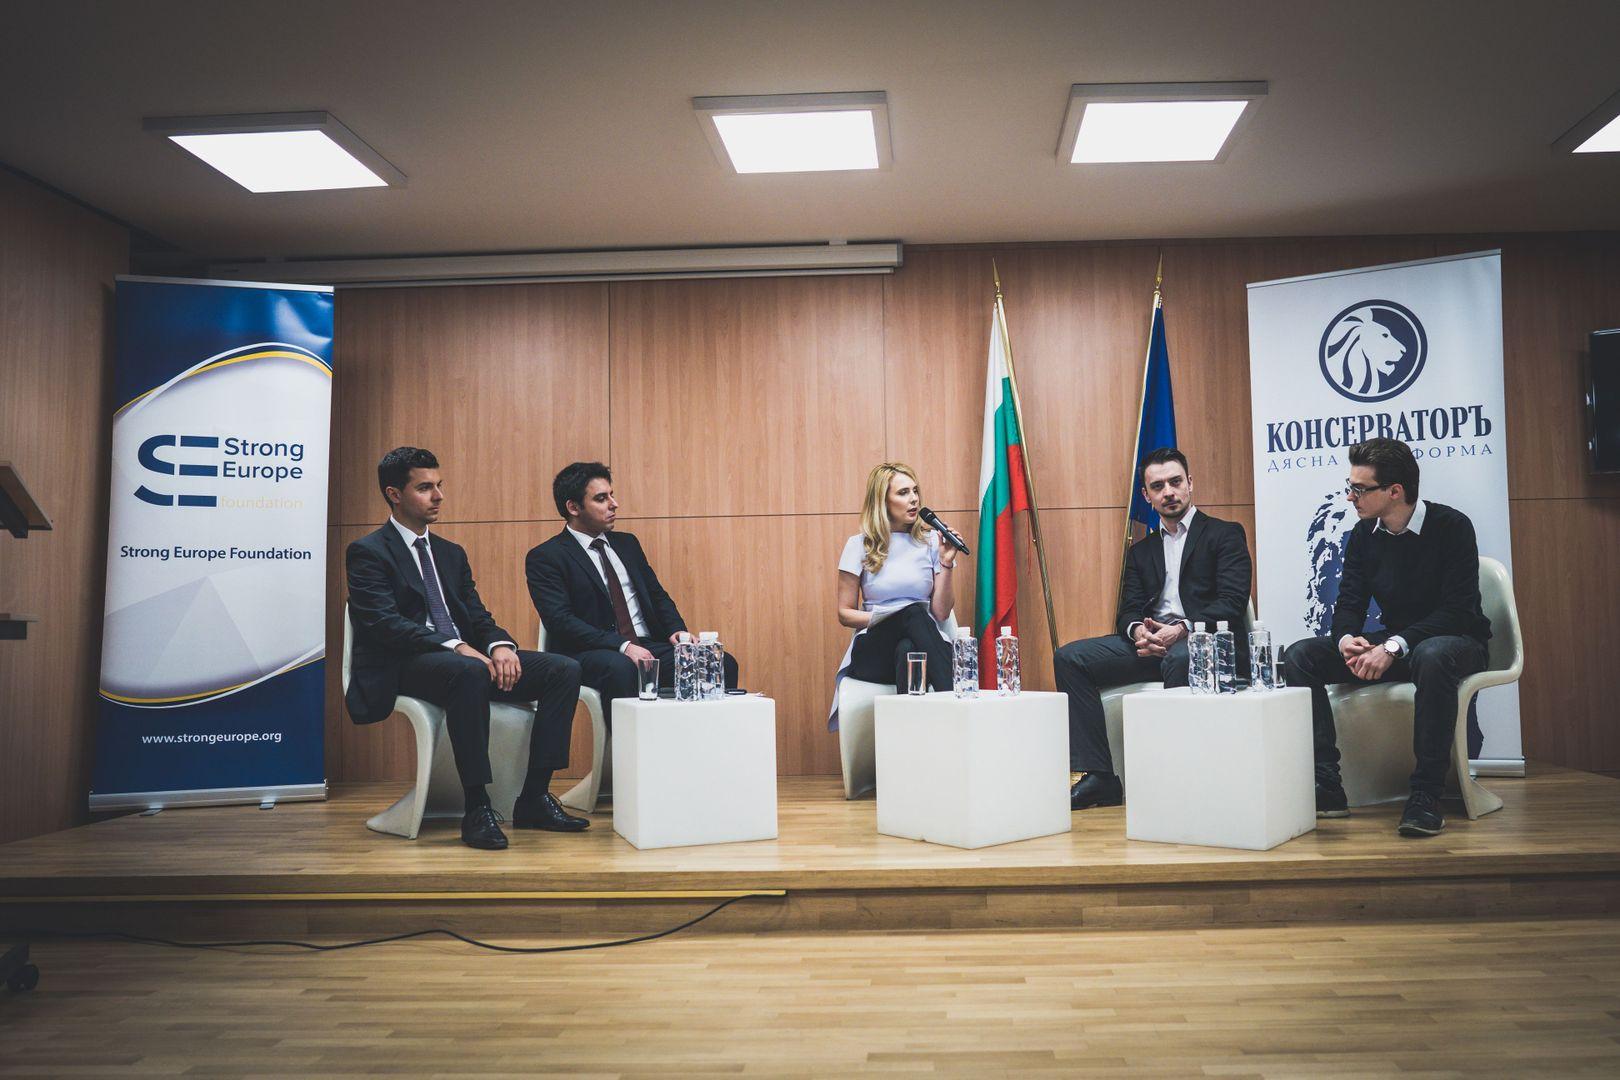 conservative-millenium-strongeurope-event-april-19